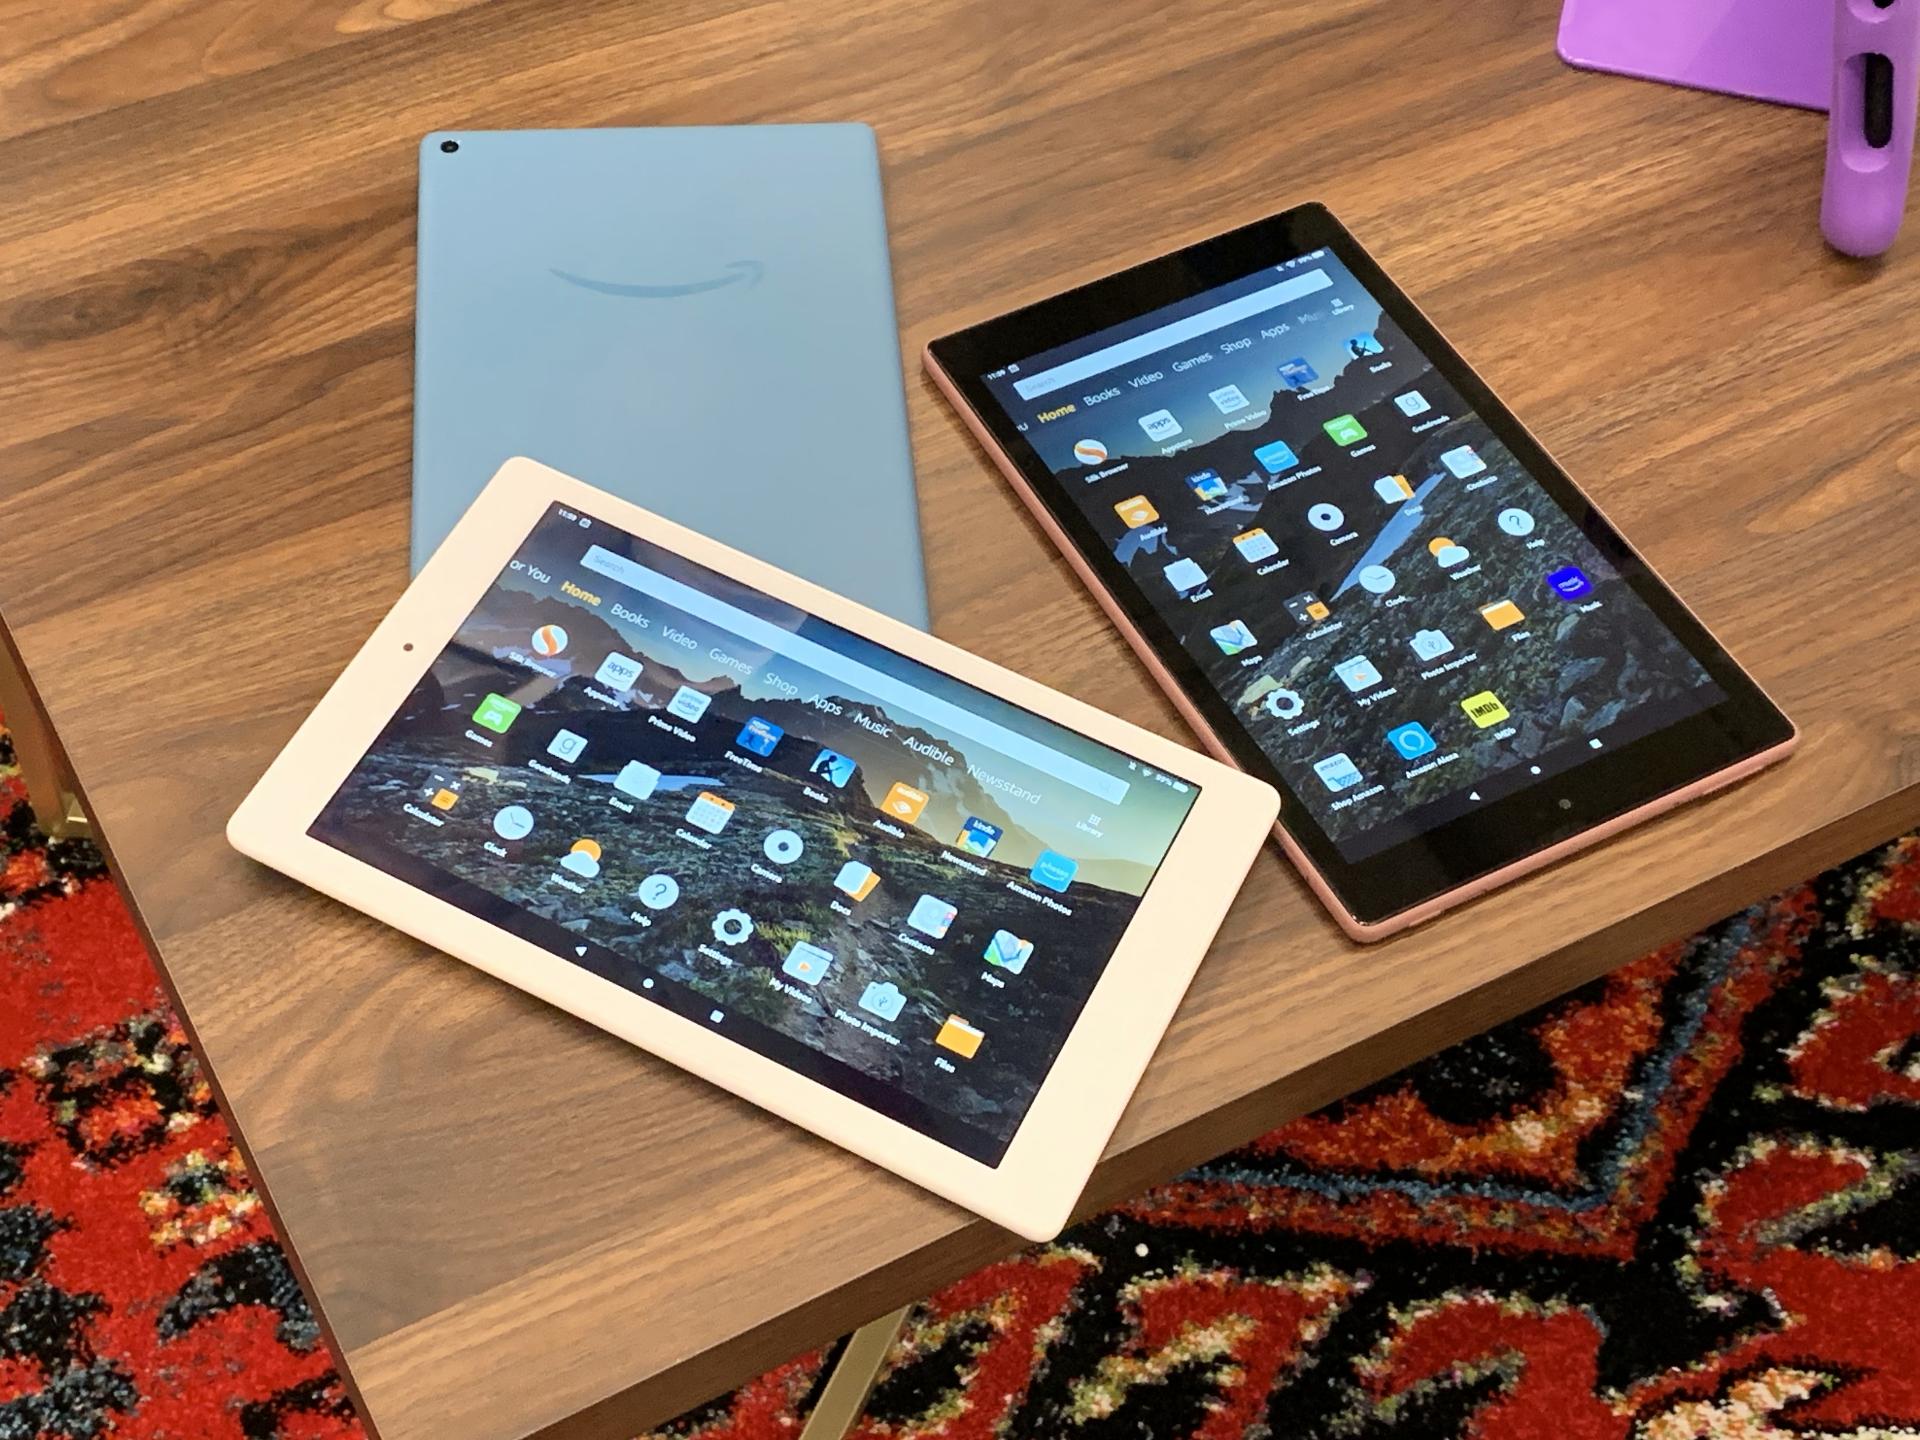 Amazon's Fire HD 10 tablet.